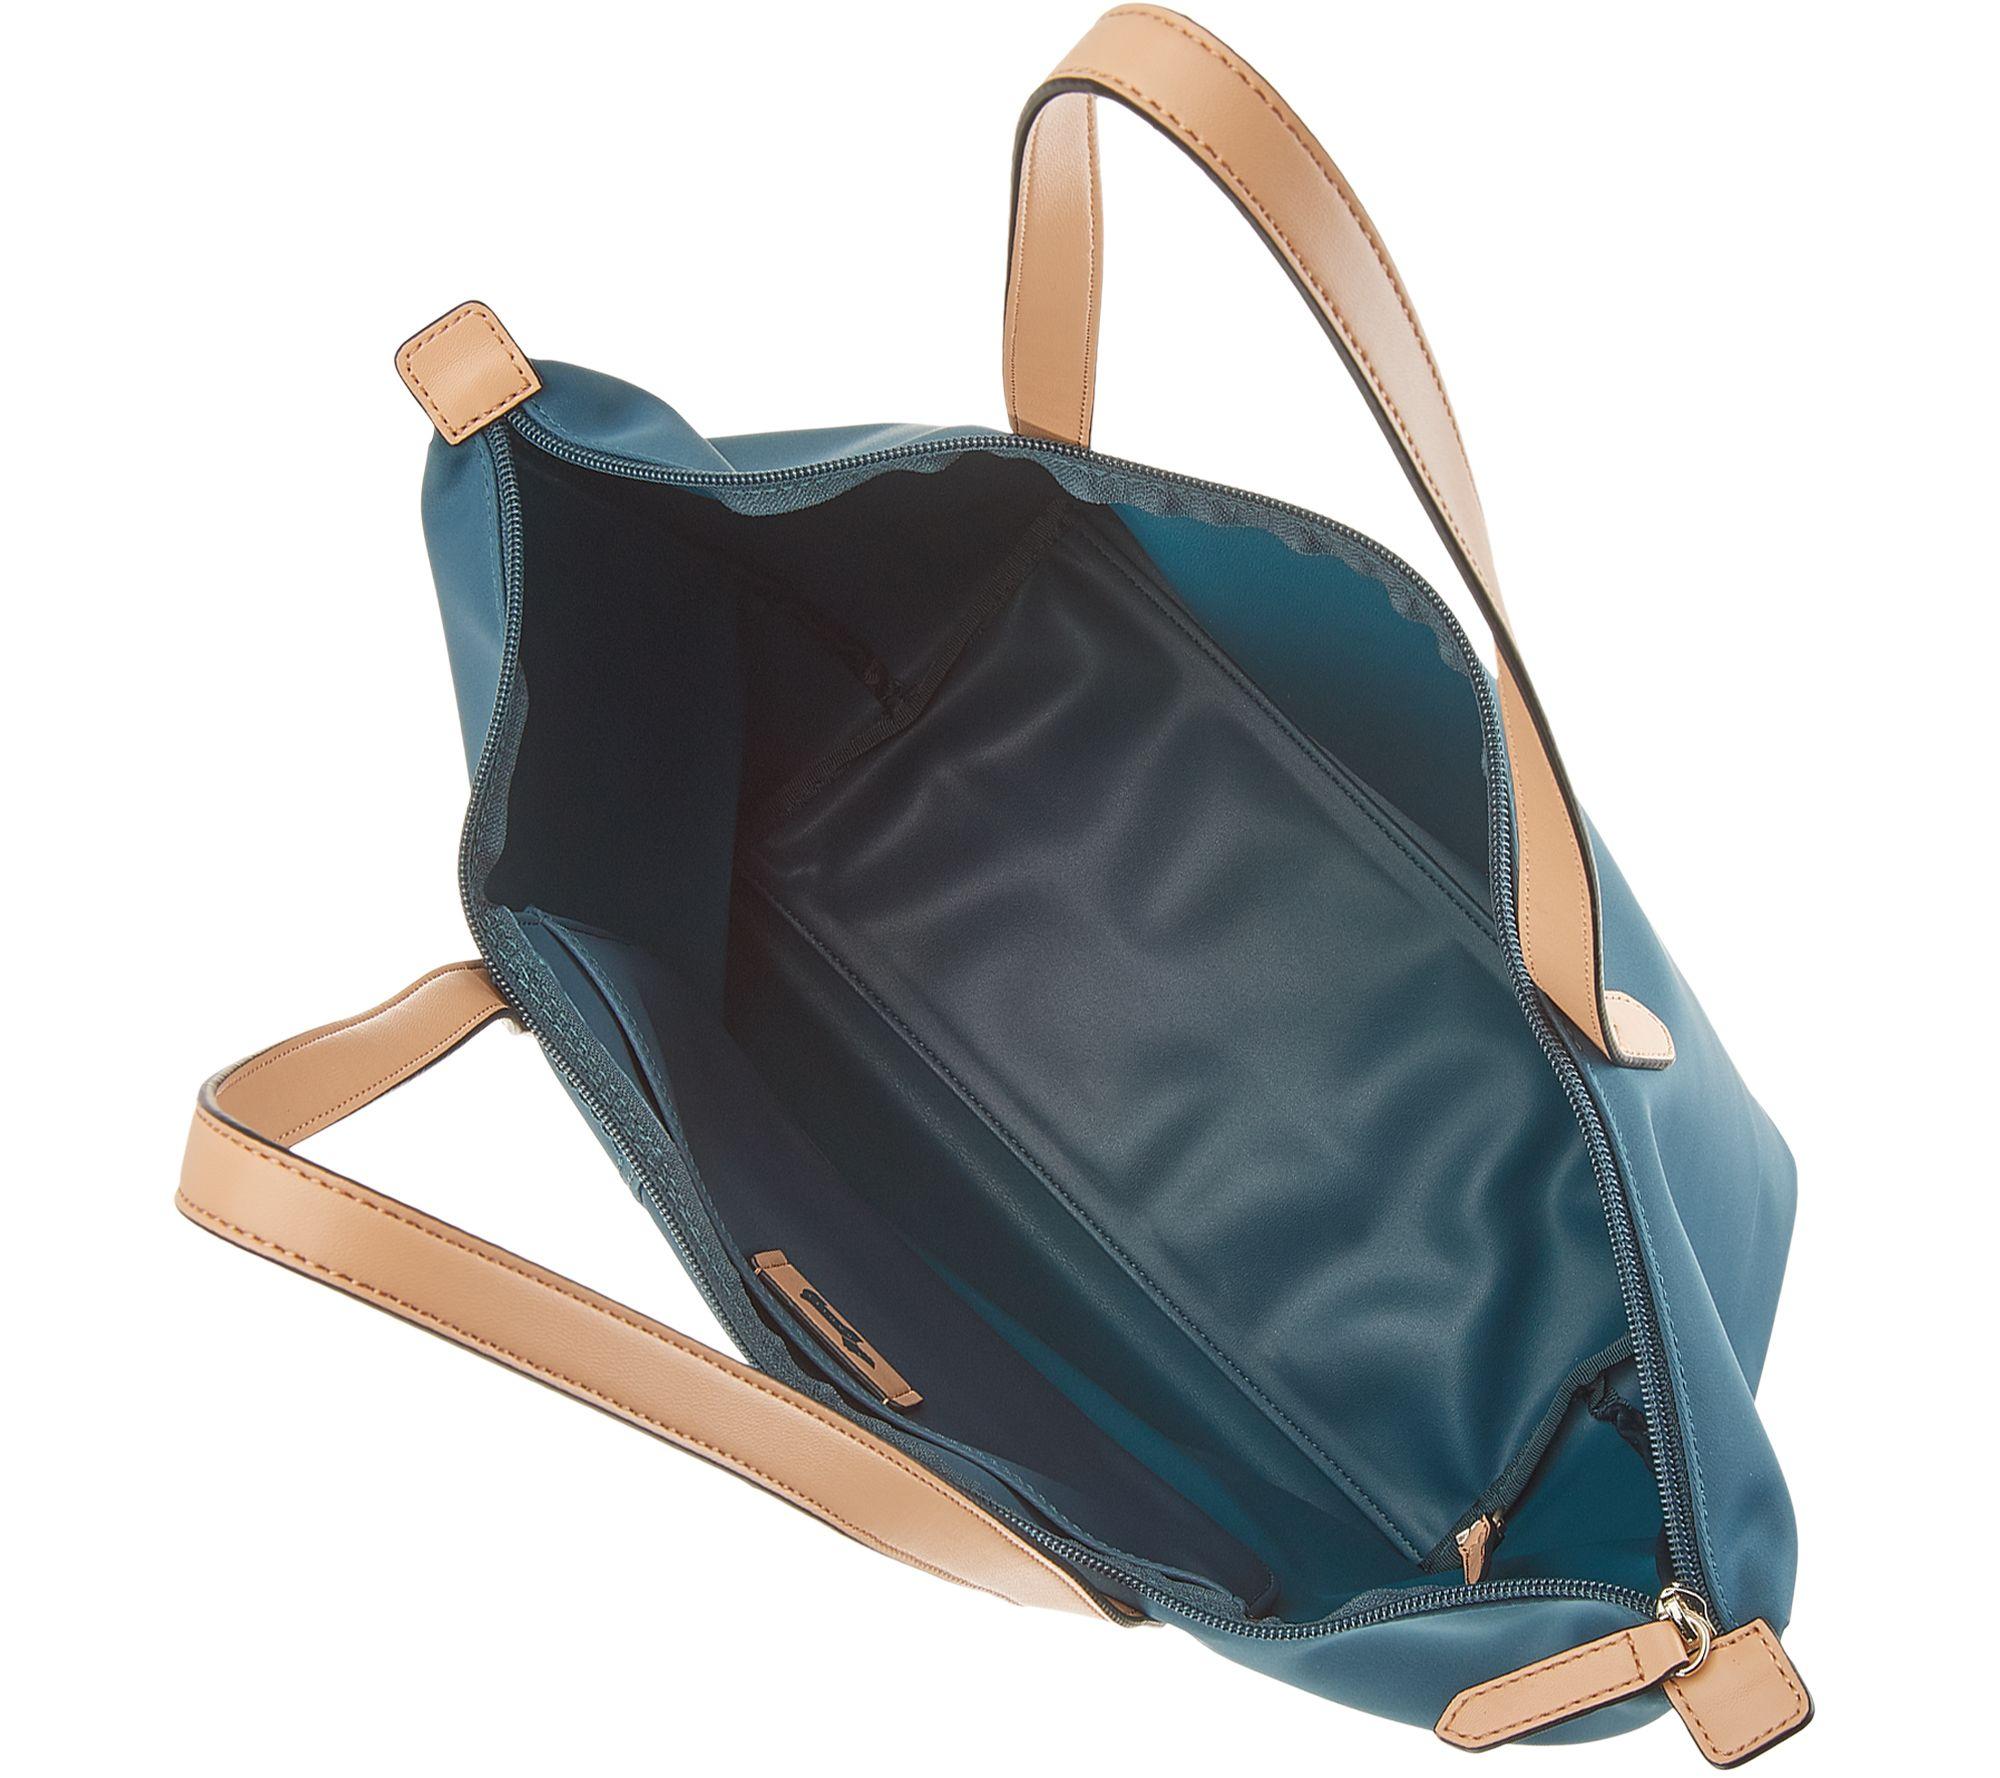 Radley London Pocket Essentials Large Ziptop Tote Handbag Page 1 Qvc